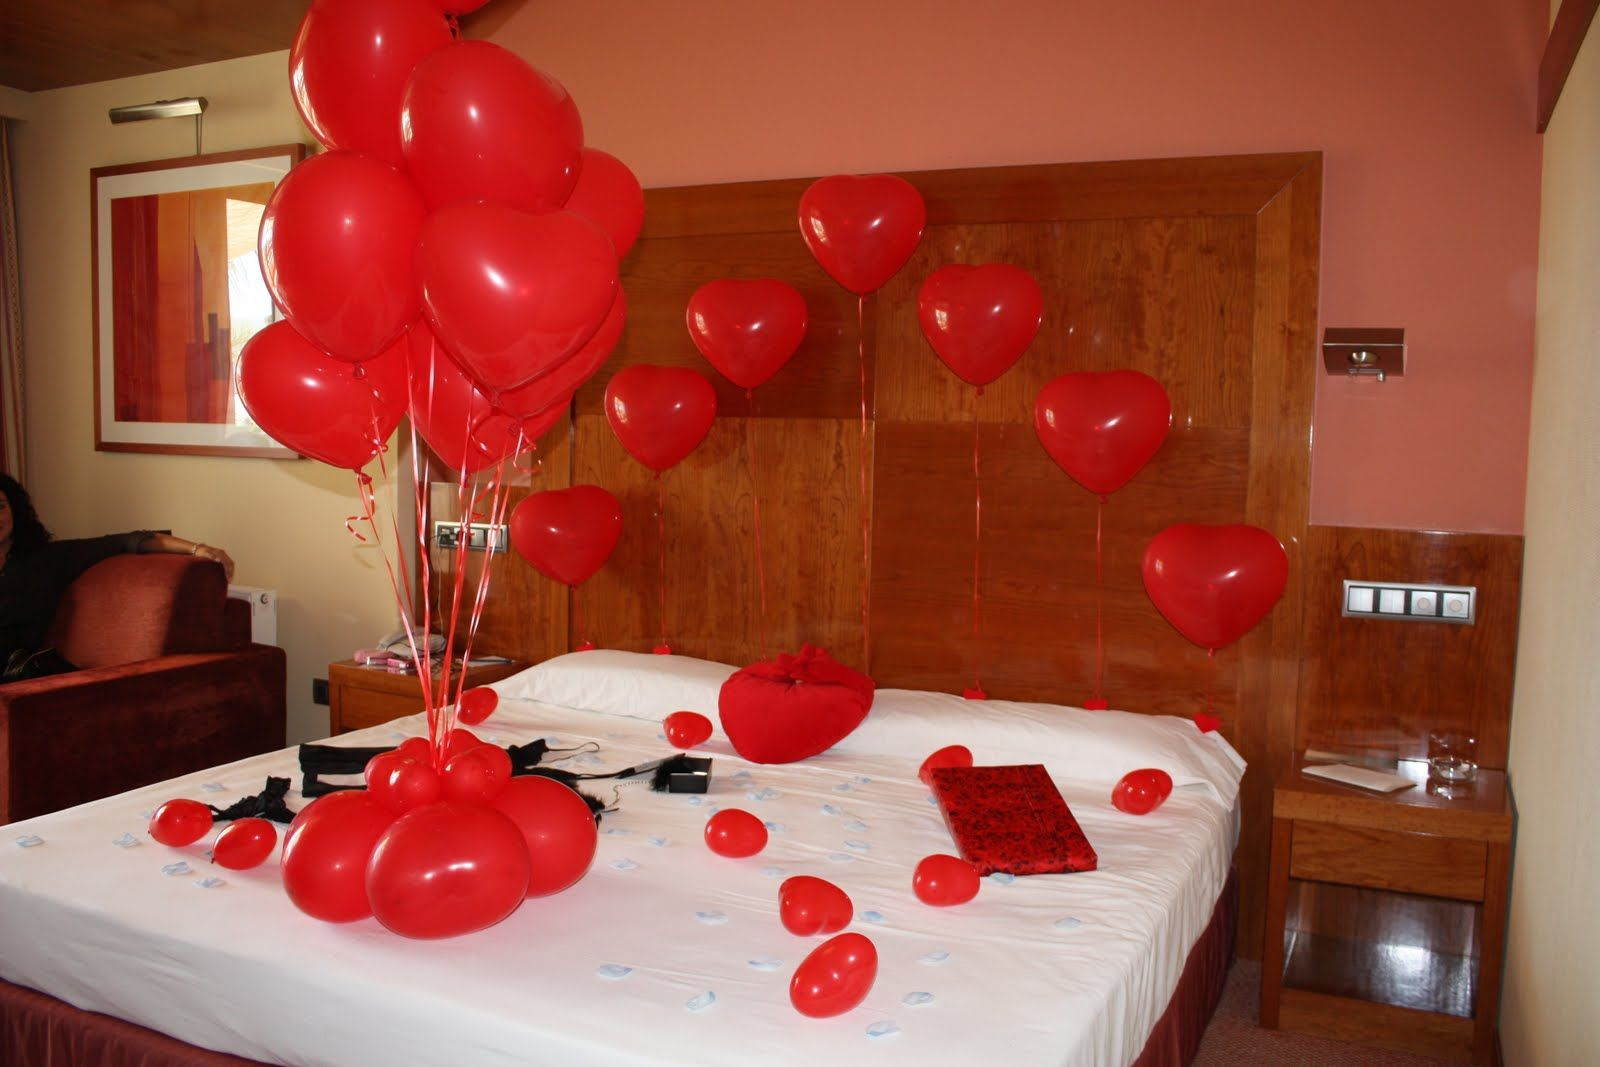 Img 8110 jpg 1600 1067 ideas de decoraci n romantica for Decoracion noche romantica